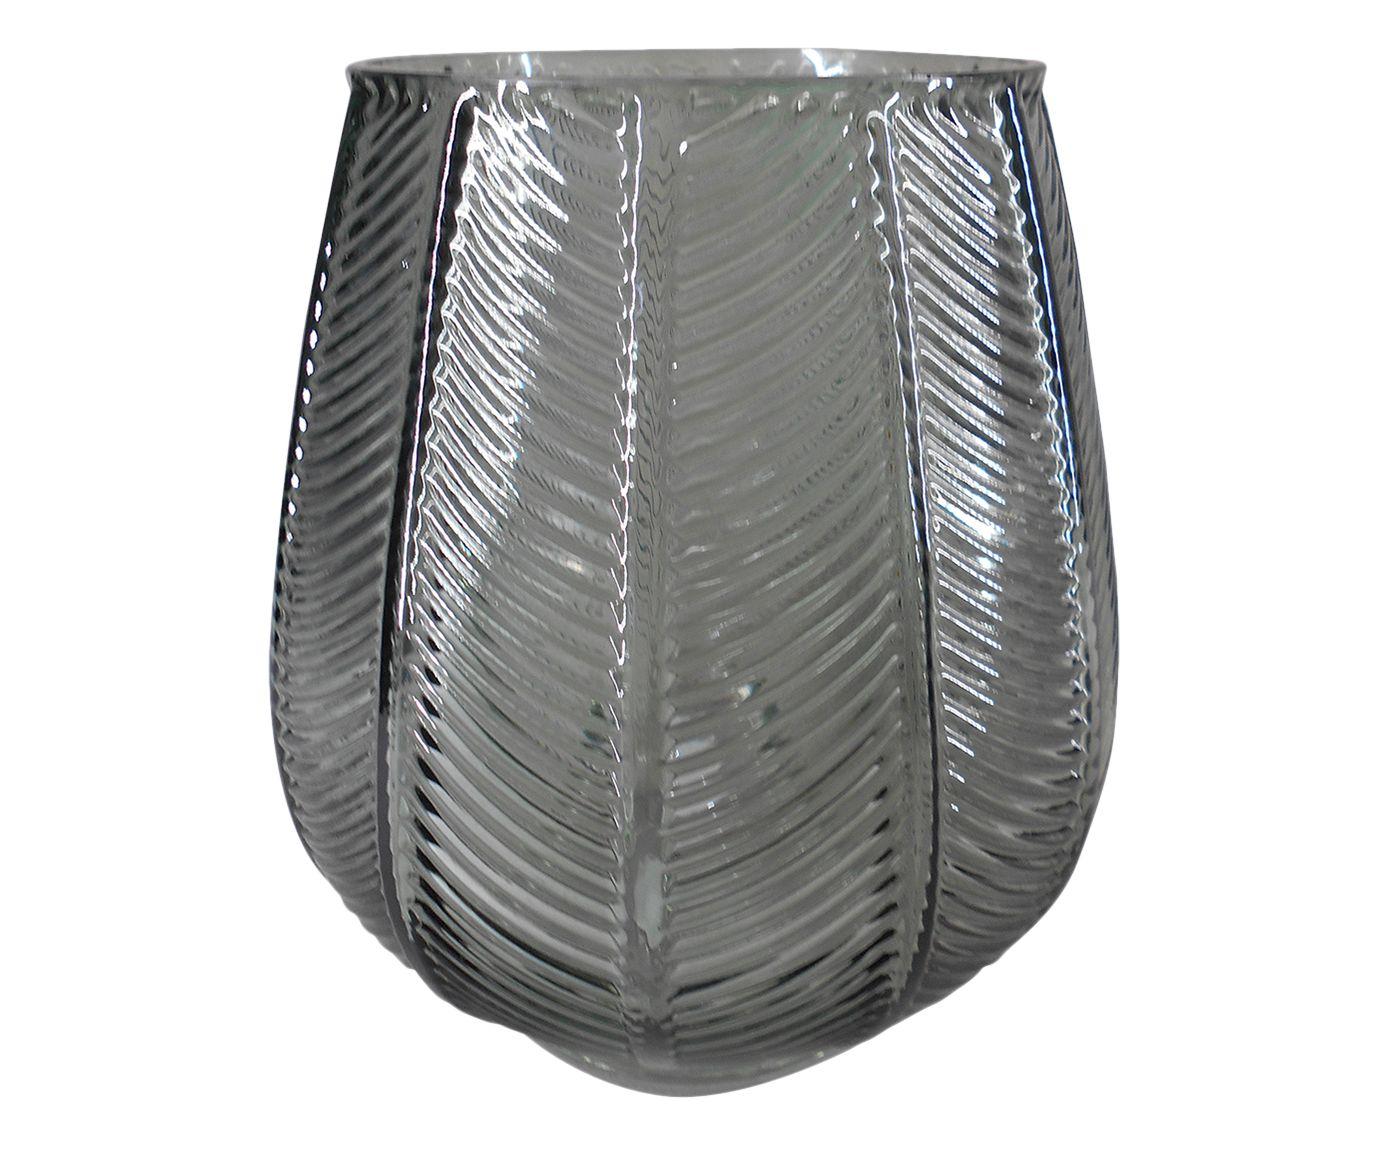 Vaso Pola Fumê - 18cm   Westwing.com.br